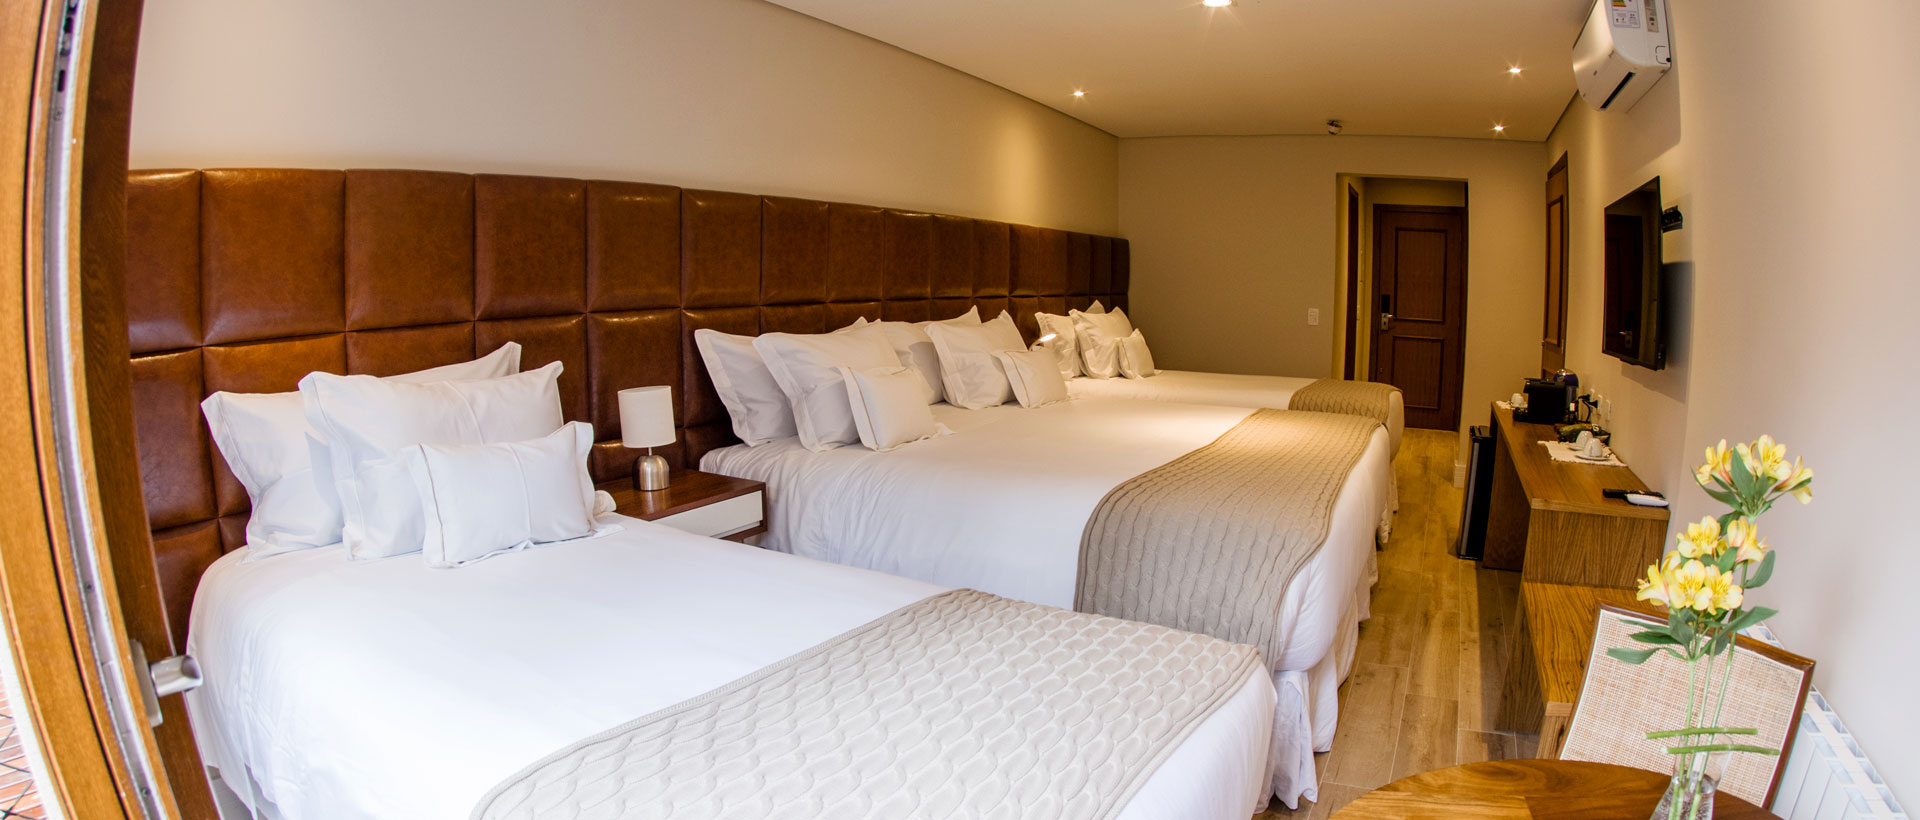 platanus-hotel-boutique-quebra-noz-conforto-e-natureza